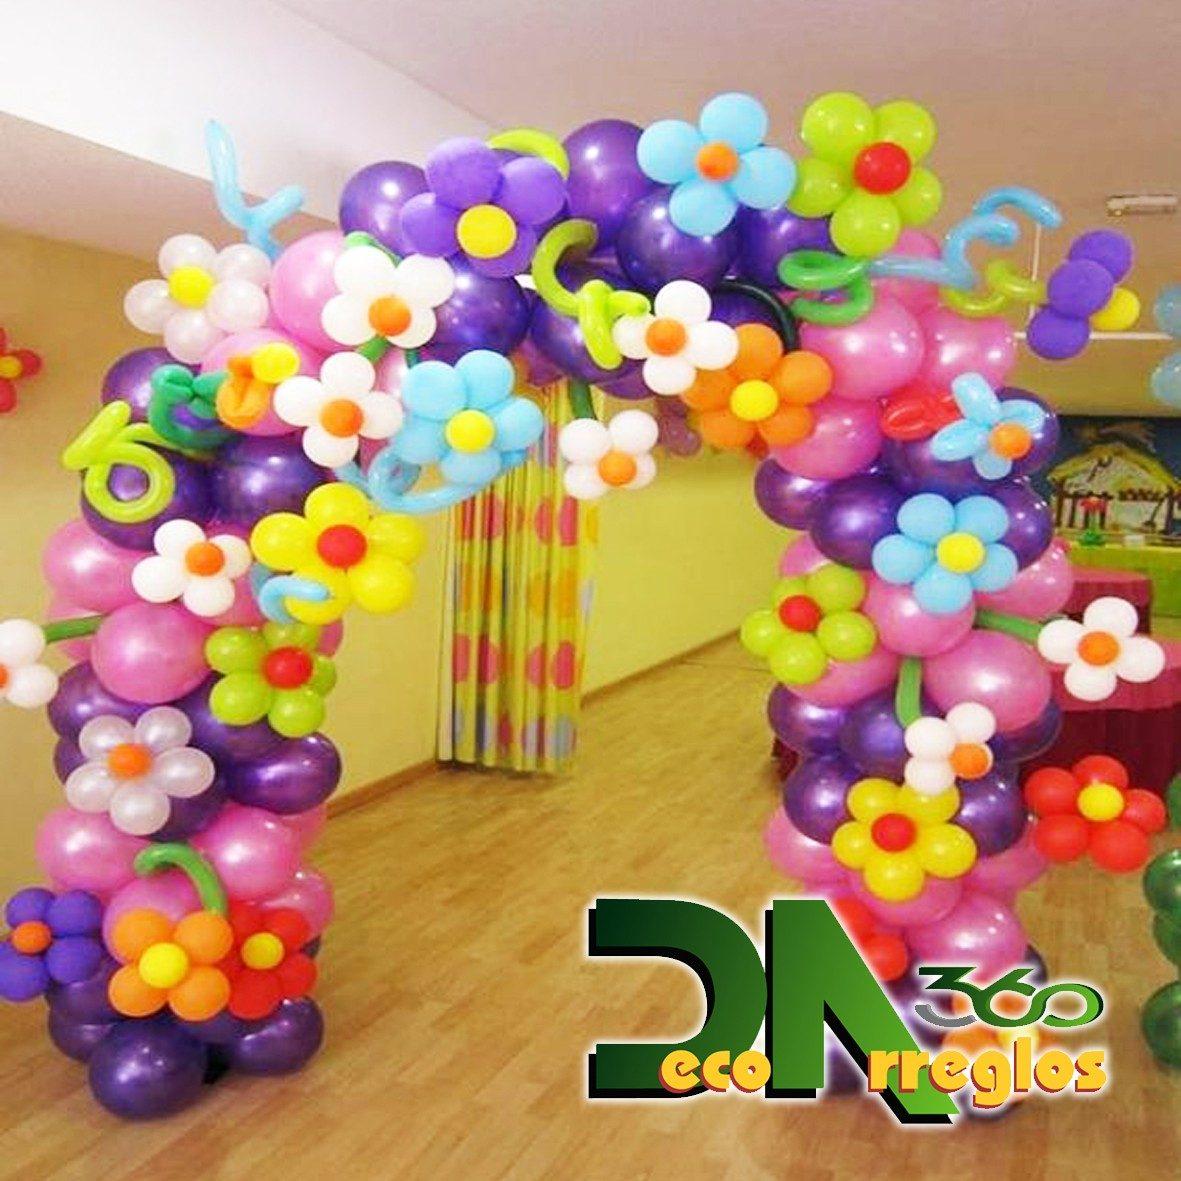 Arcos columnas marcos para fotos y cascadas de globos - Decoracion de marcos para fotos ...